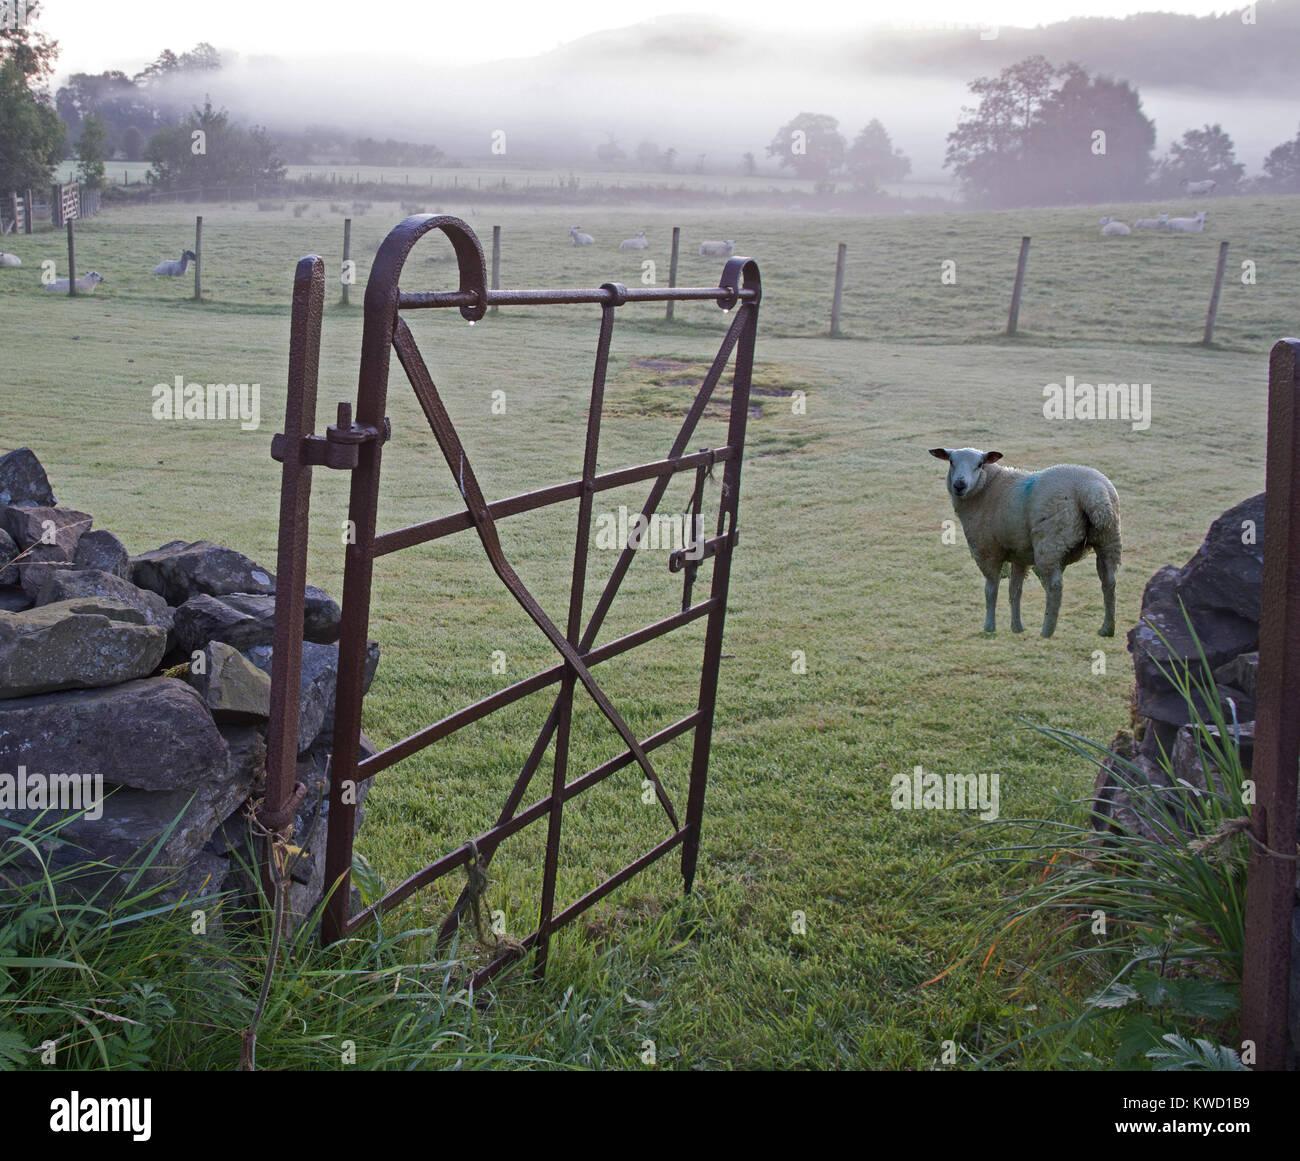 Misty morning on Hawkshead Hall Farm with open five barred metal gate and sheep in heavy dew near Hawkshead Cumbria - Stock Image